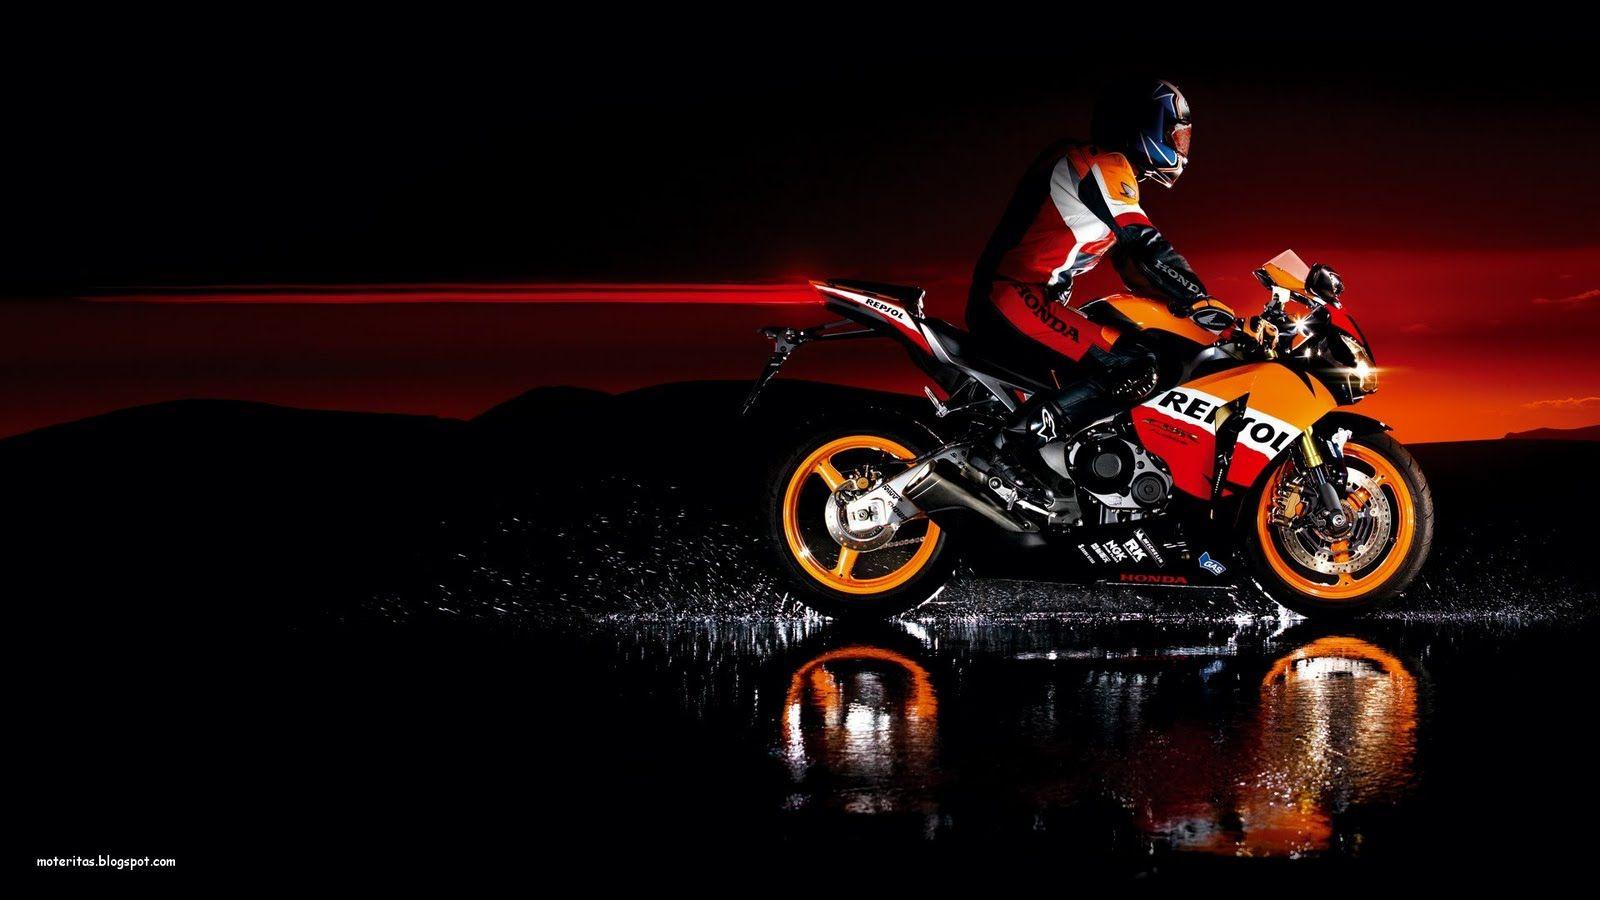 Honda CBR Repsol Wallpapers   Top Honda CBR Repsol 1600x900